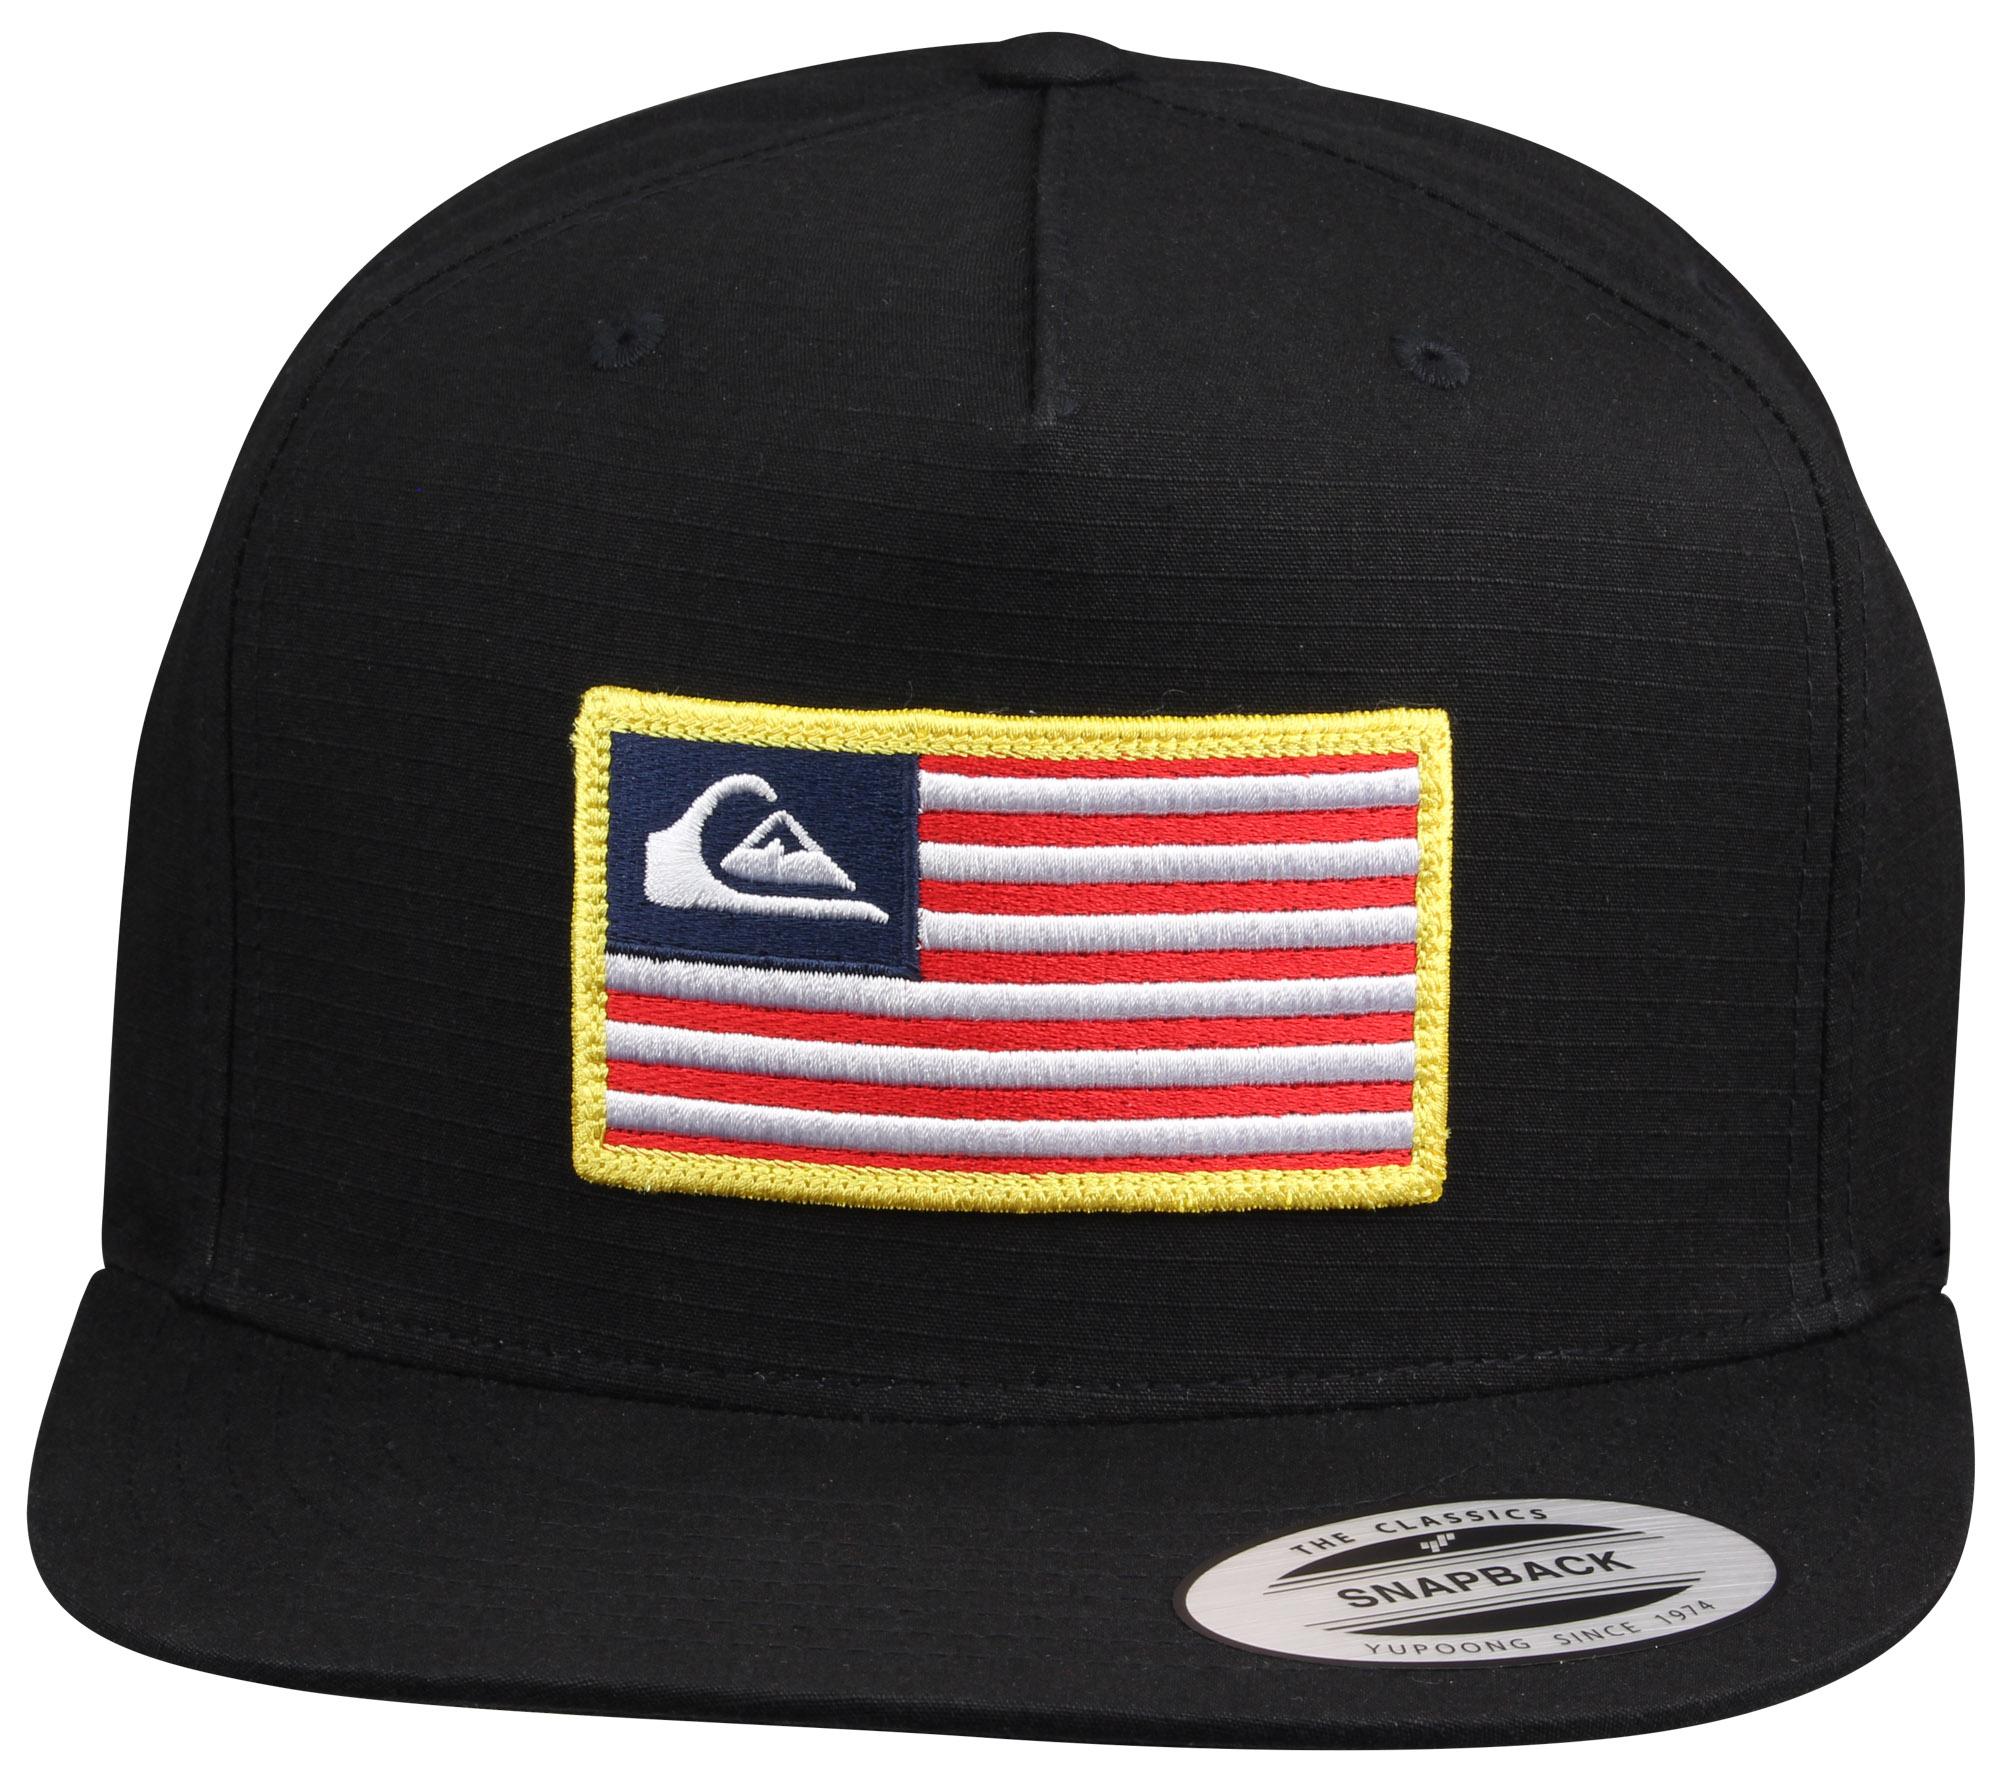 newest 7bc11 92cf0 Quiksilver Tonal Pride Snapback Hat (Black) 2 2 of 5 ...